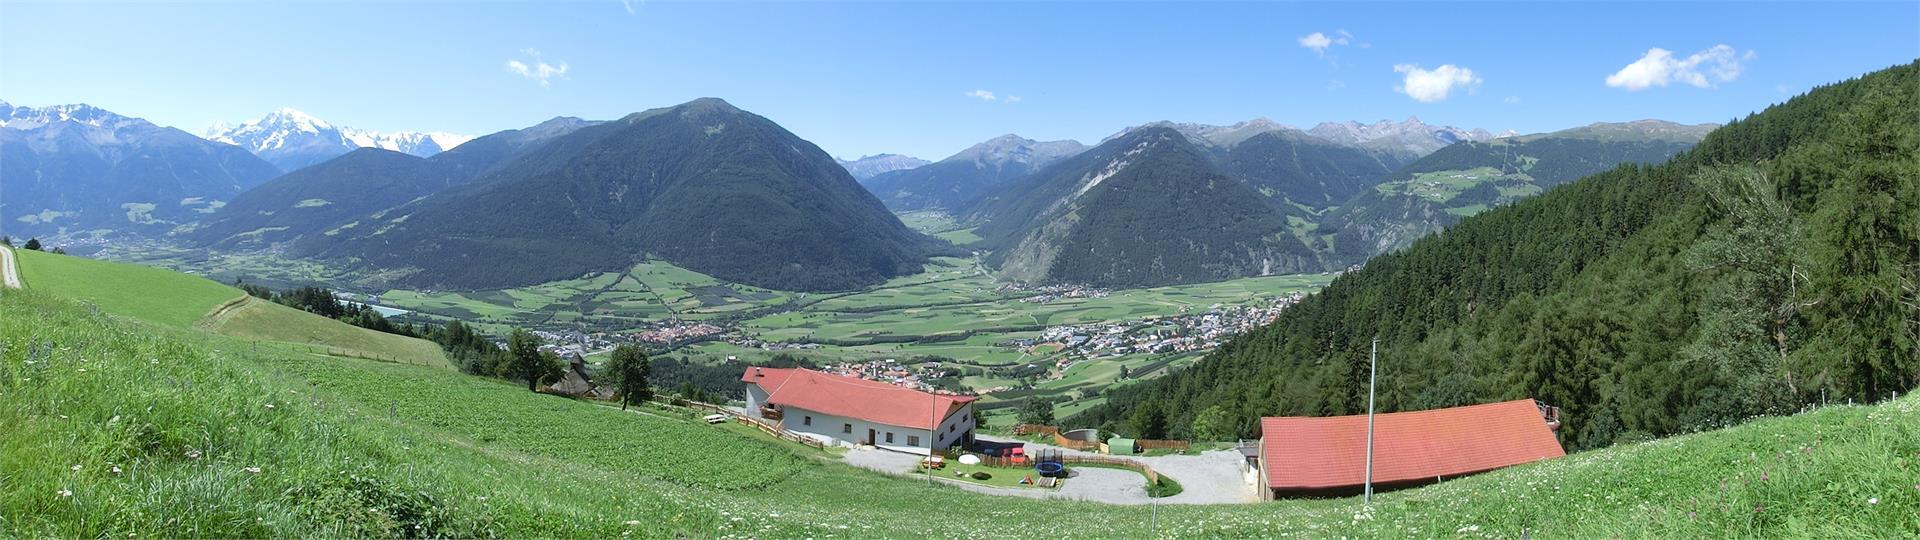 Lechtlhof mit seinem Panorama